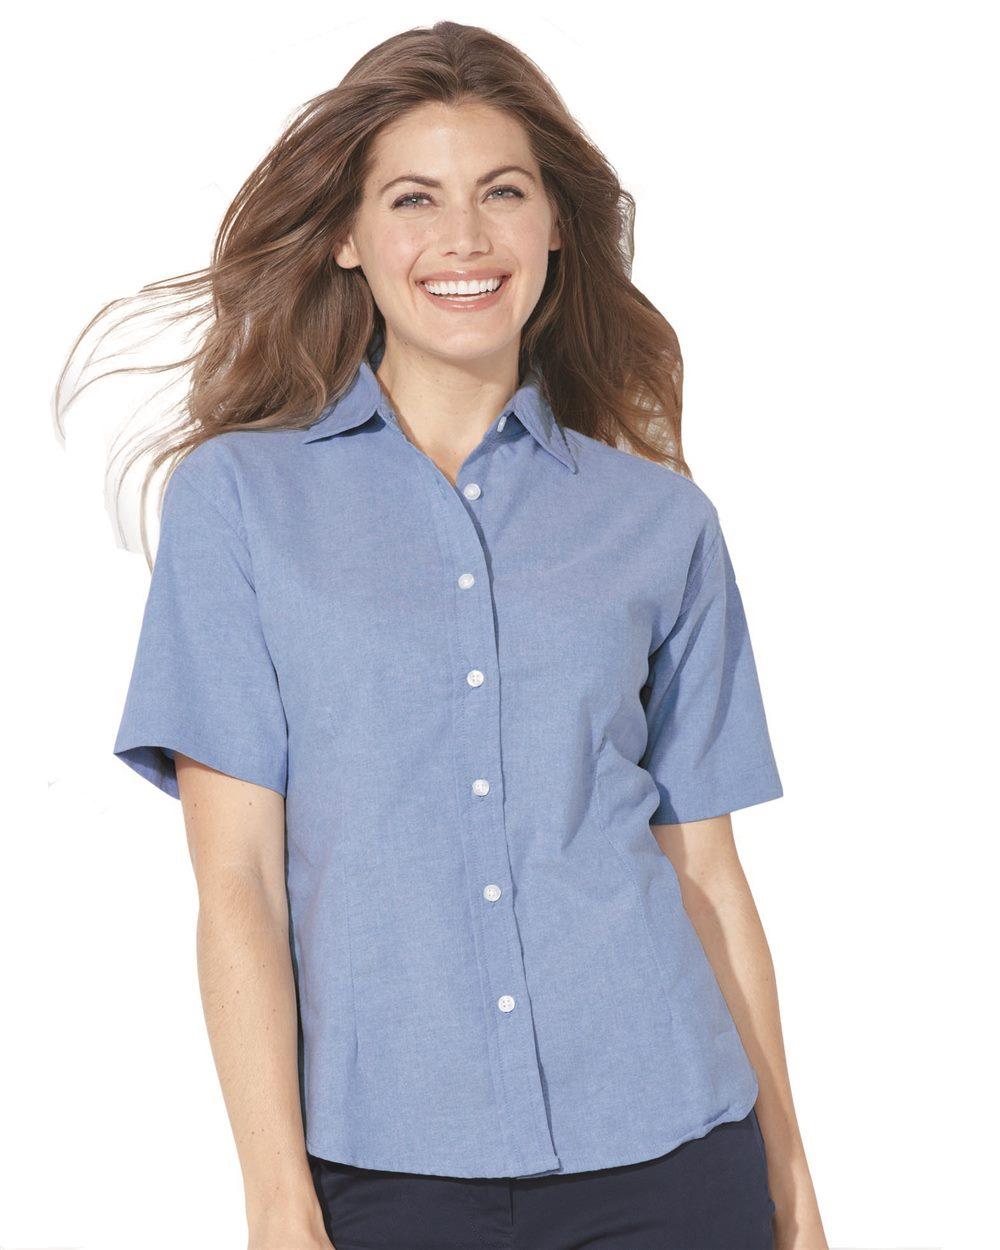 FeatherLite 5231 Ladies' Short Sleeve Oxford Shirt